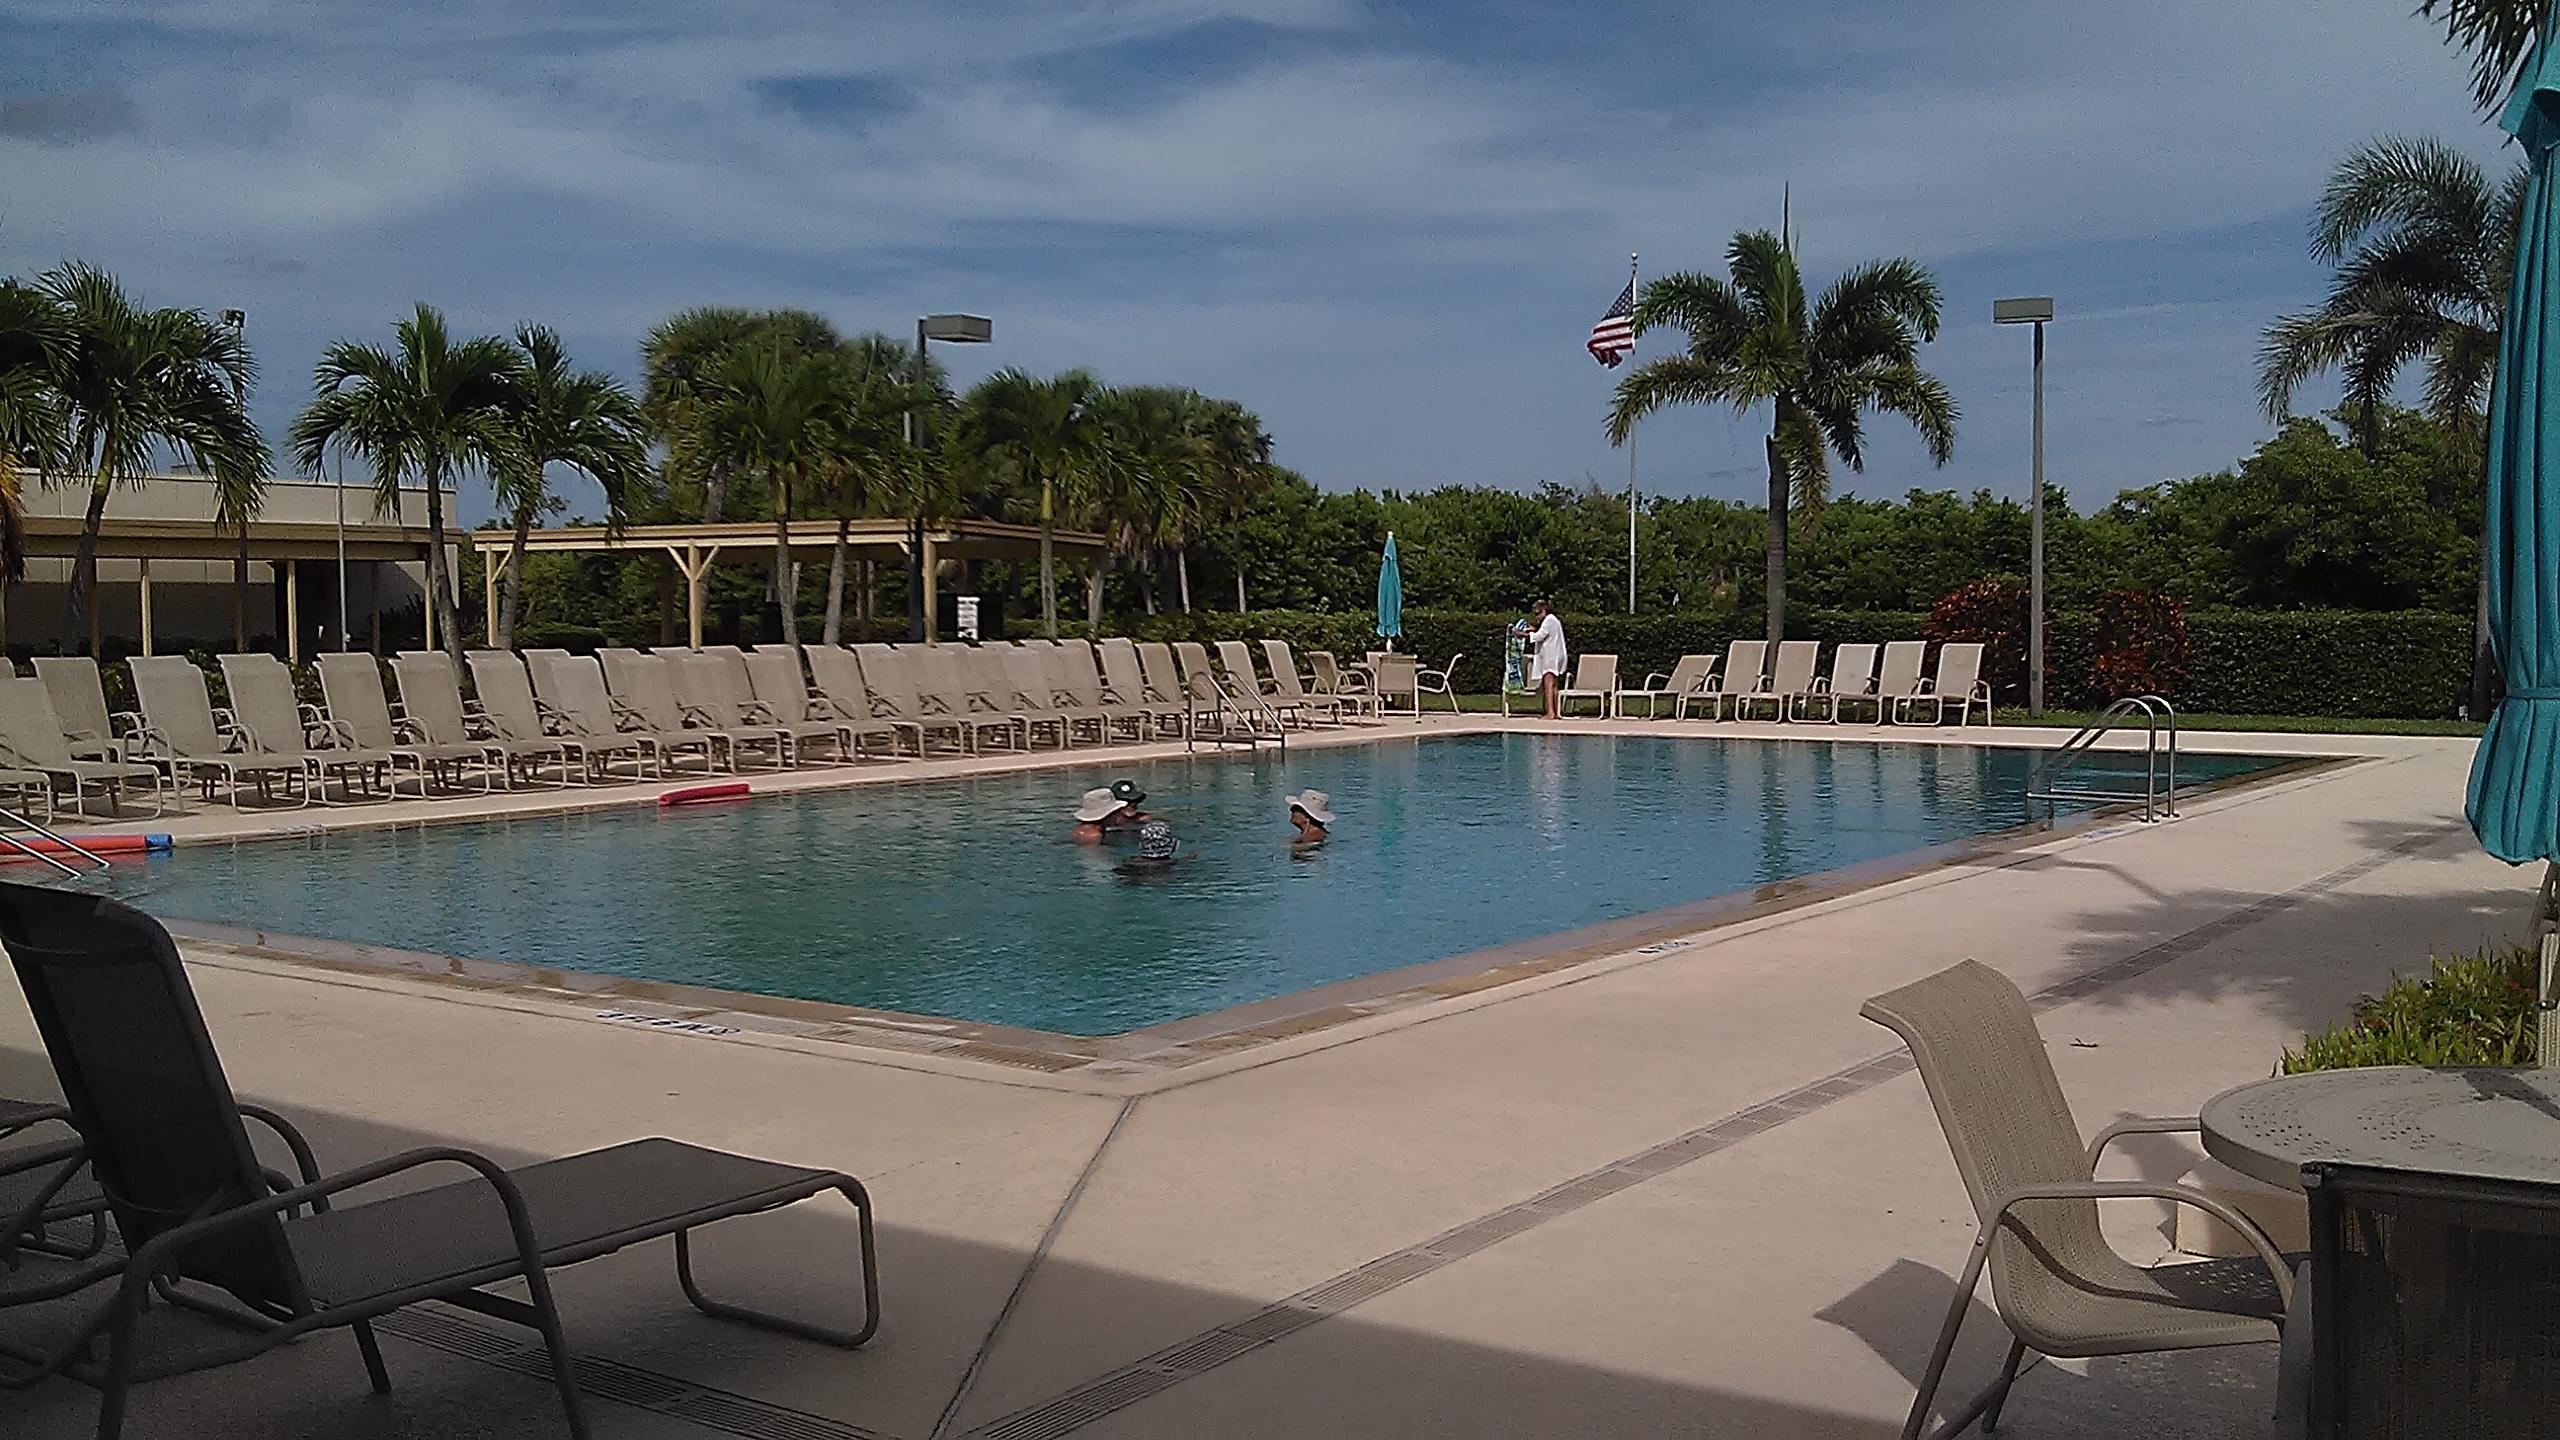 35 Vista Gardens Unit 207, Vero Beach, Florida 32962